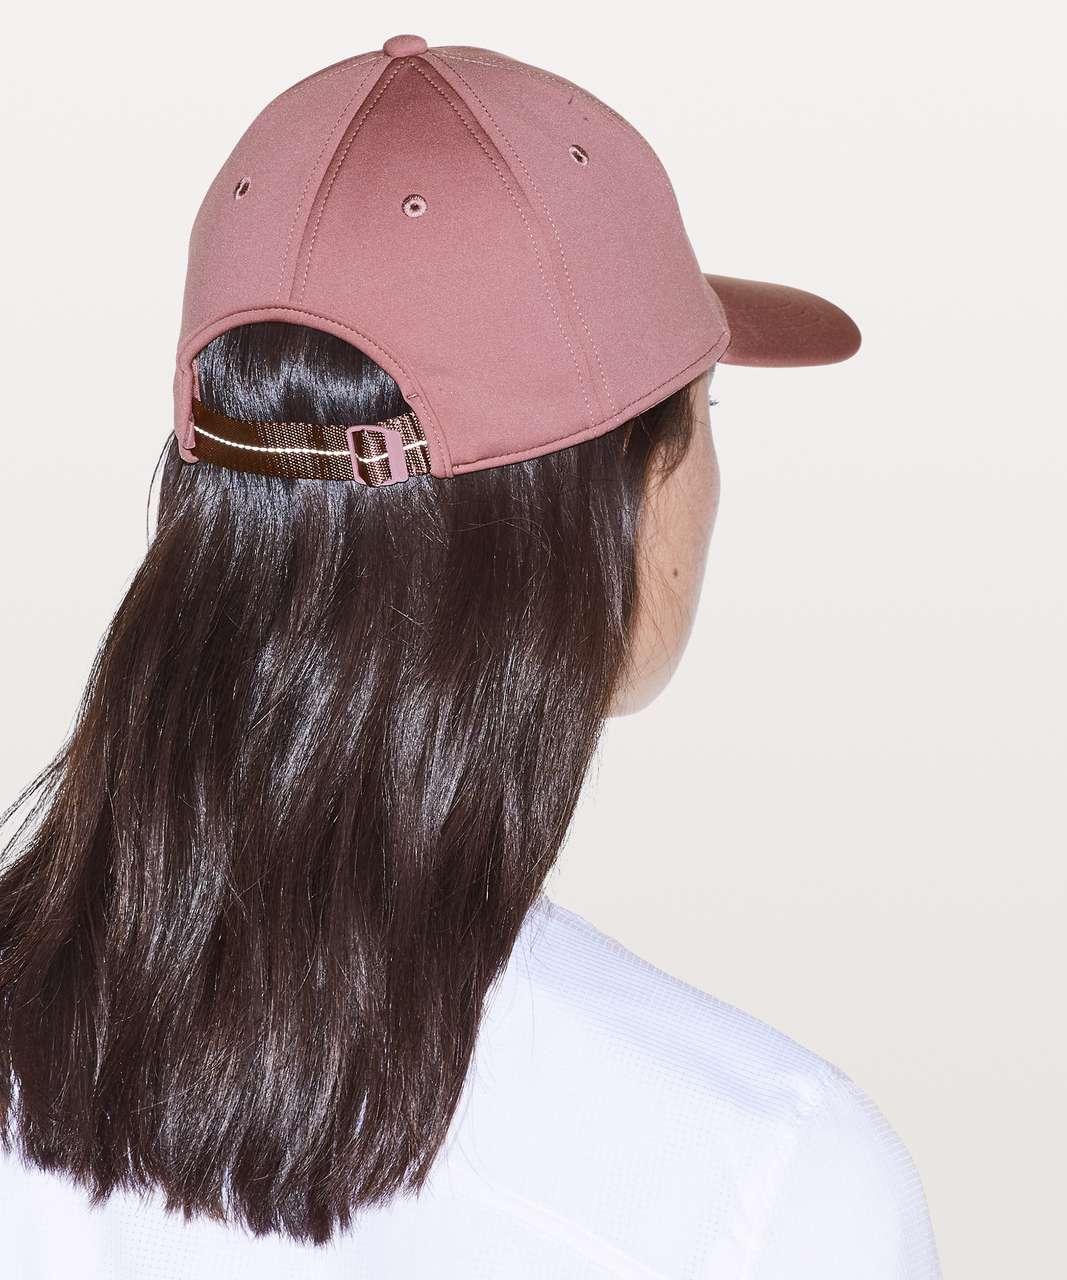 Lululemon Baller Hat - Figue